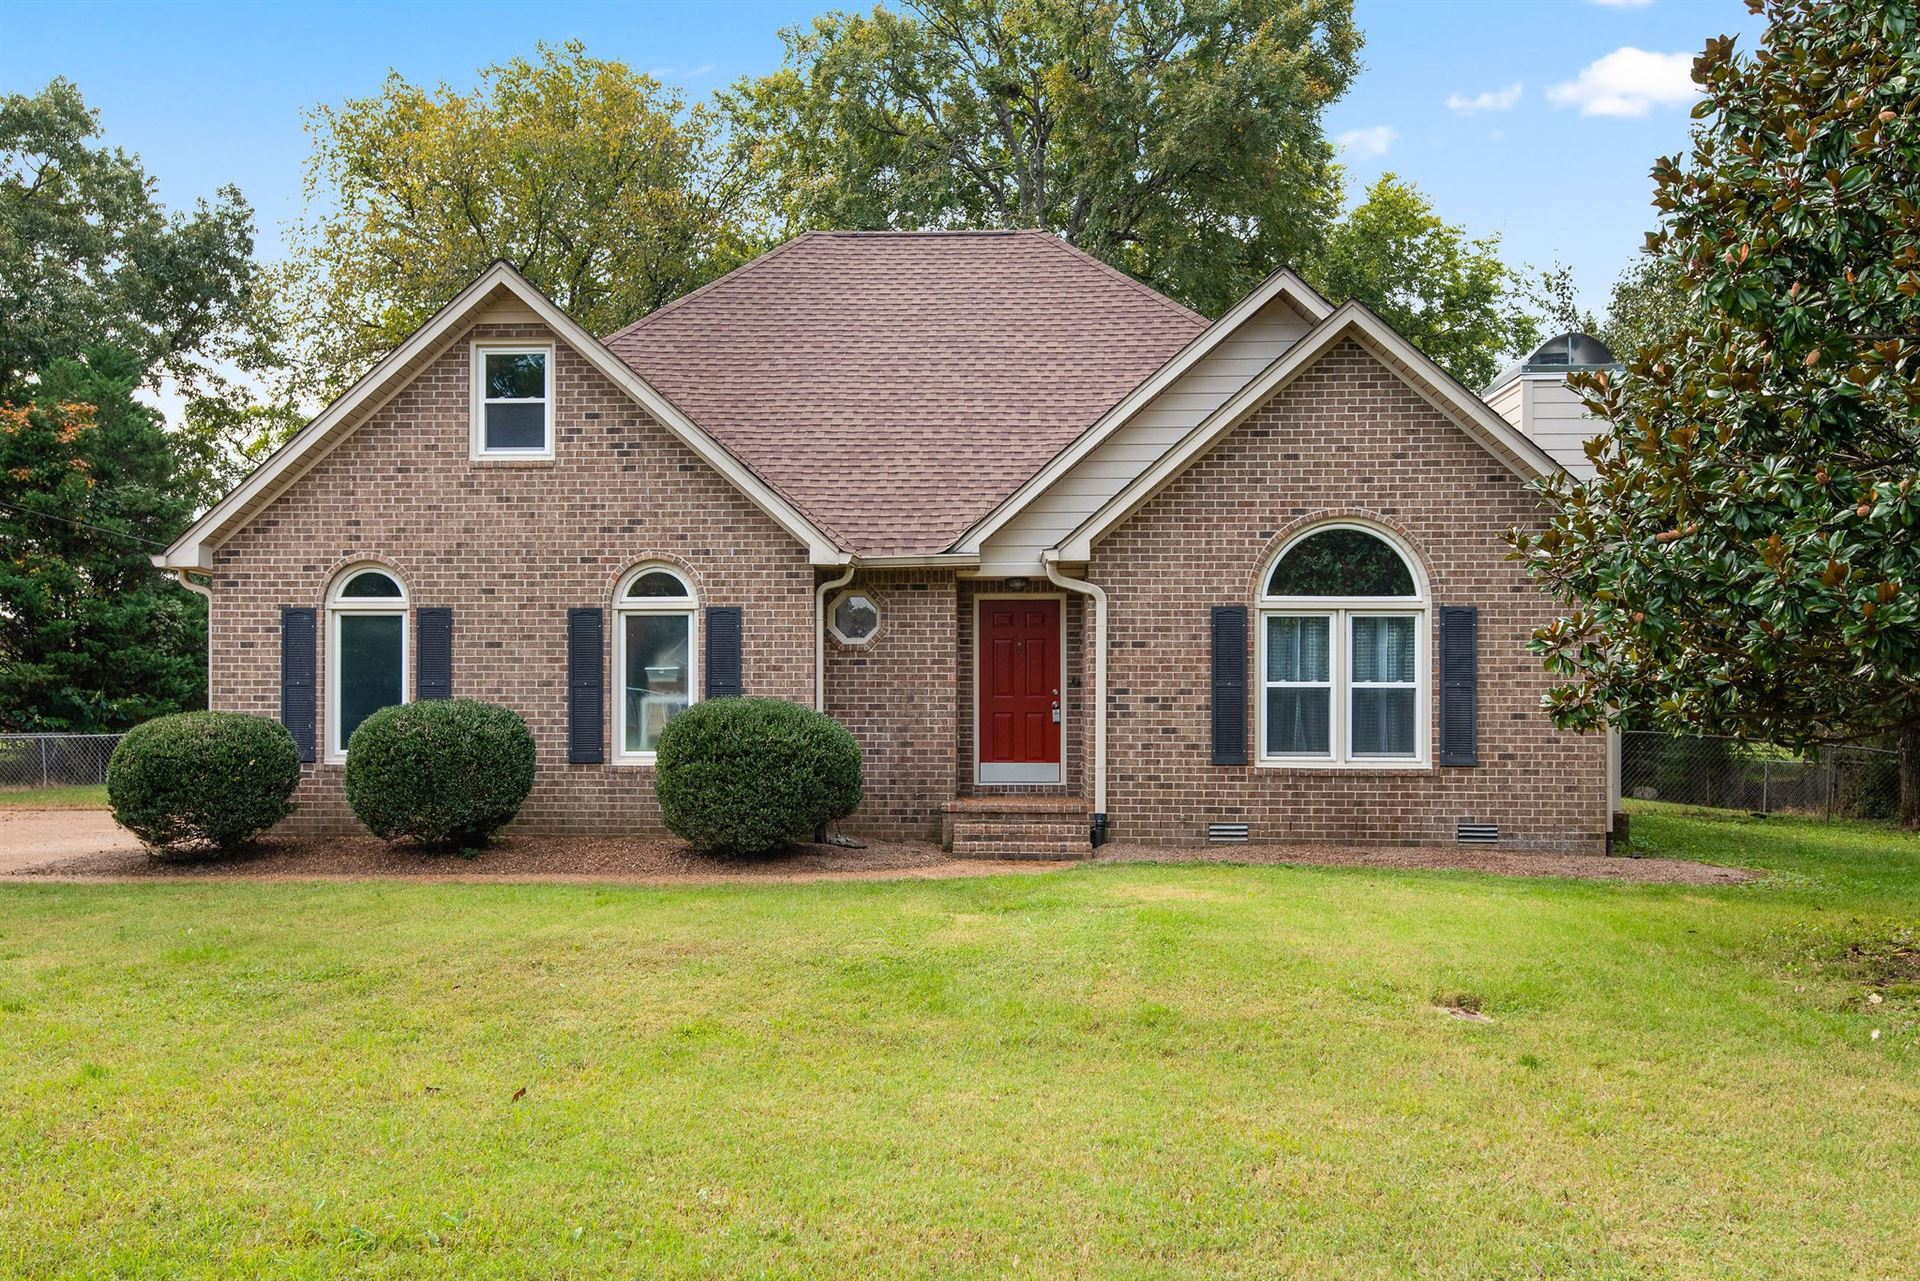 Photo of 5033 Willowbend Dr, Murfreesboro, TN 37128 (MLS # 2296414)